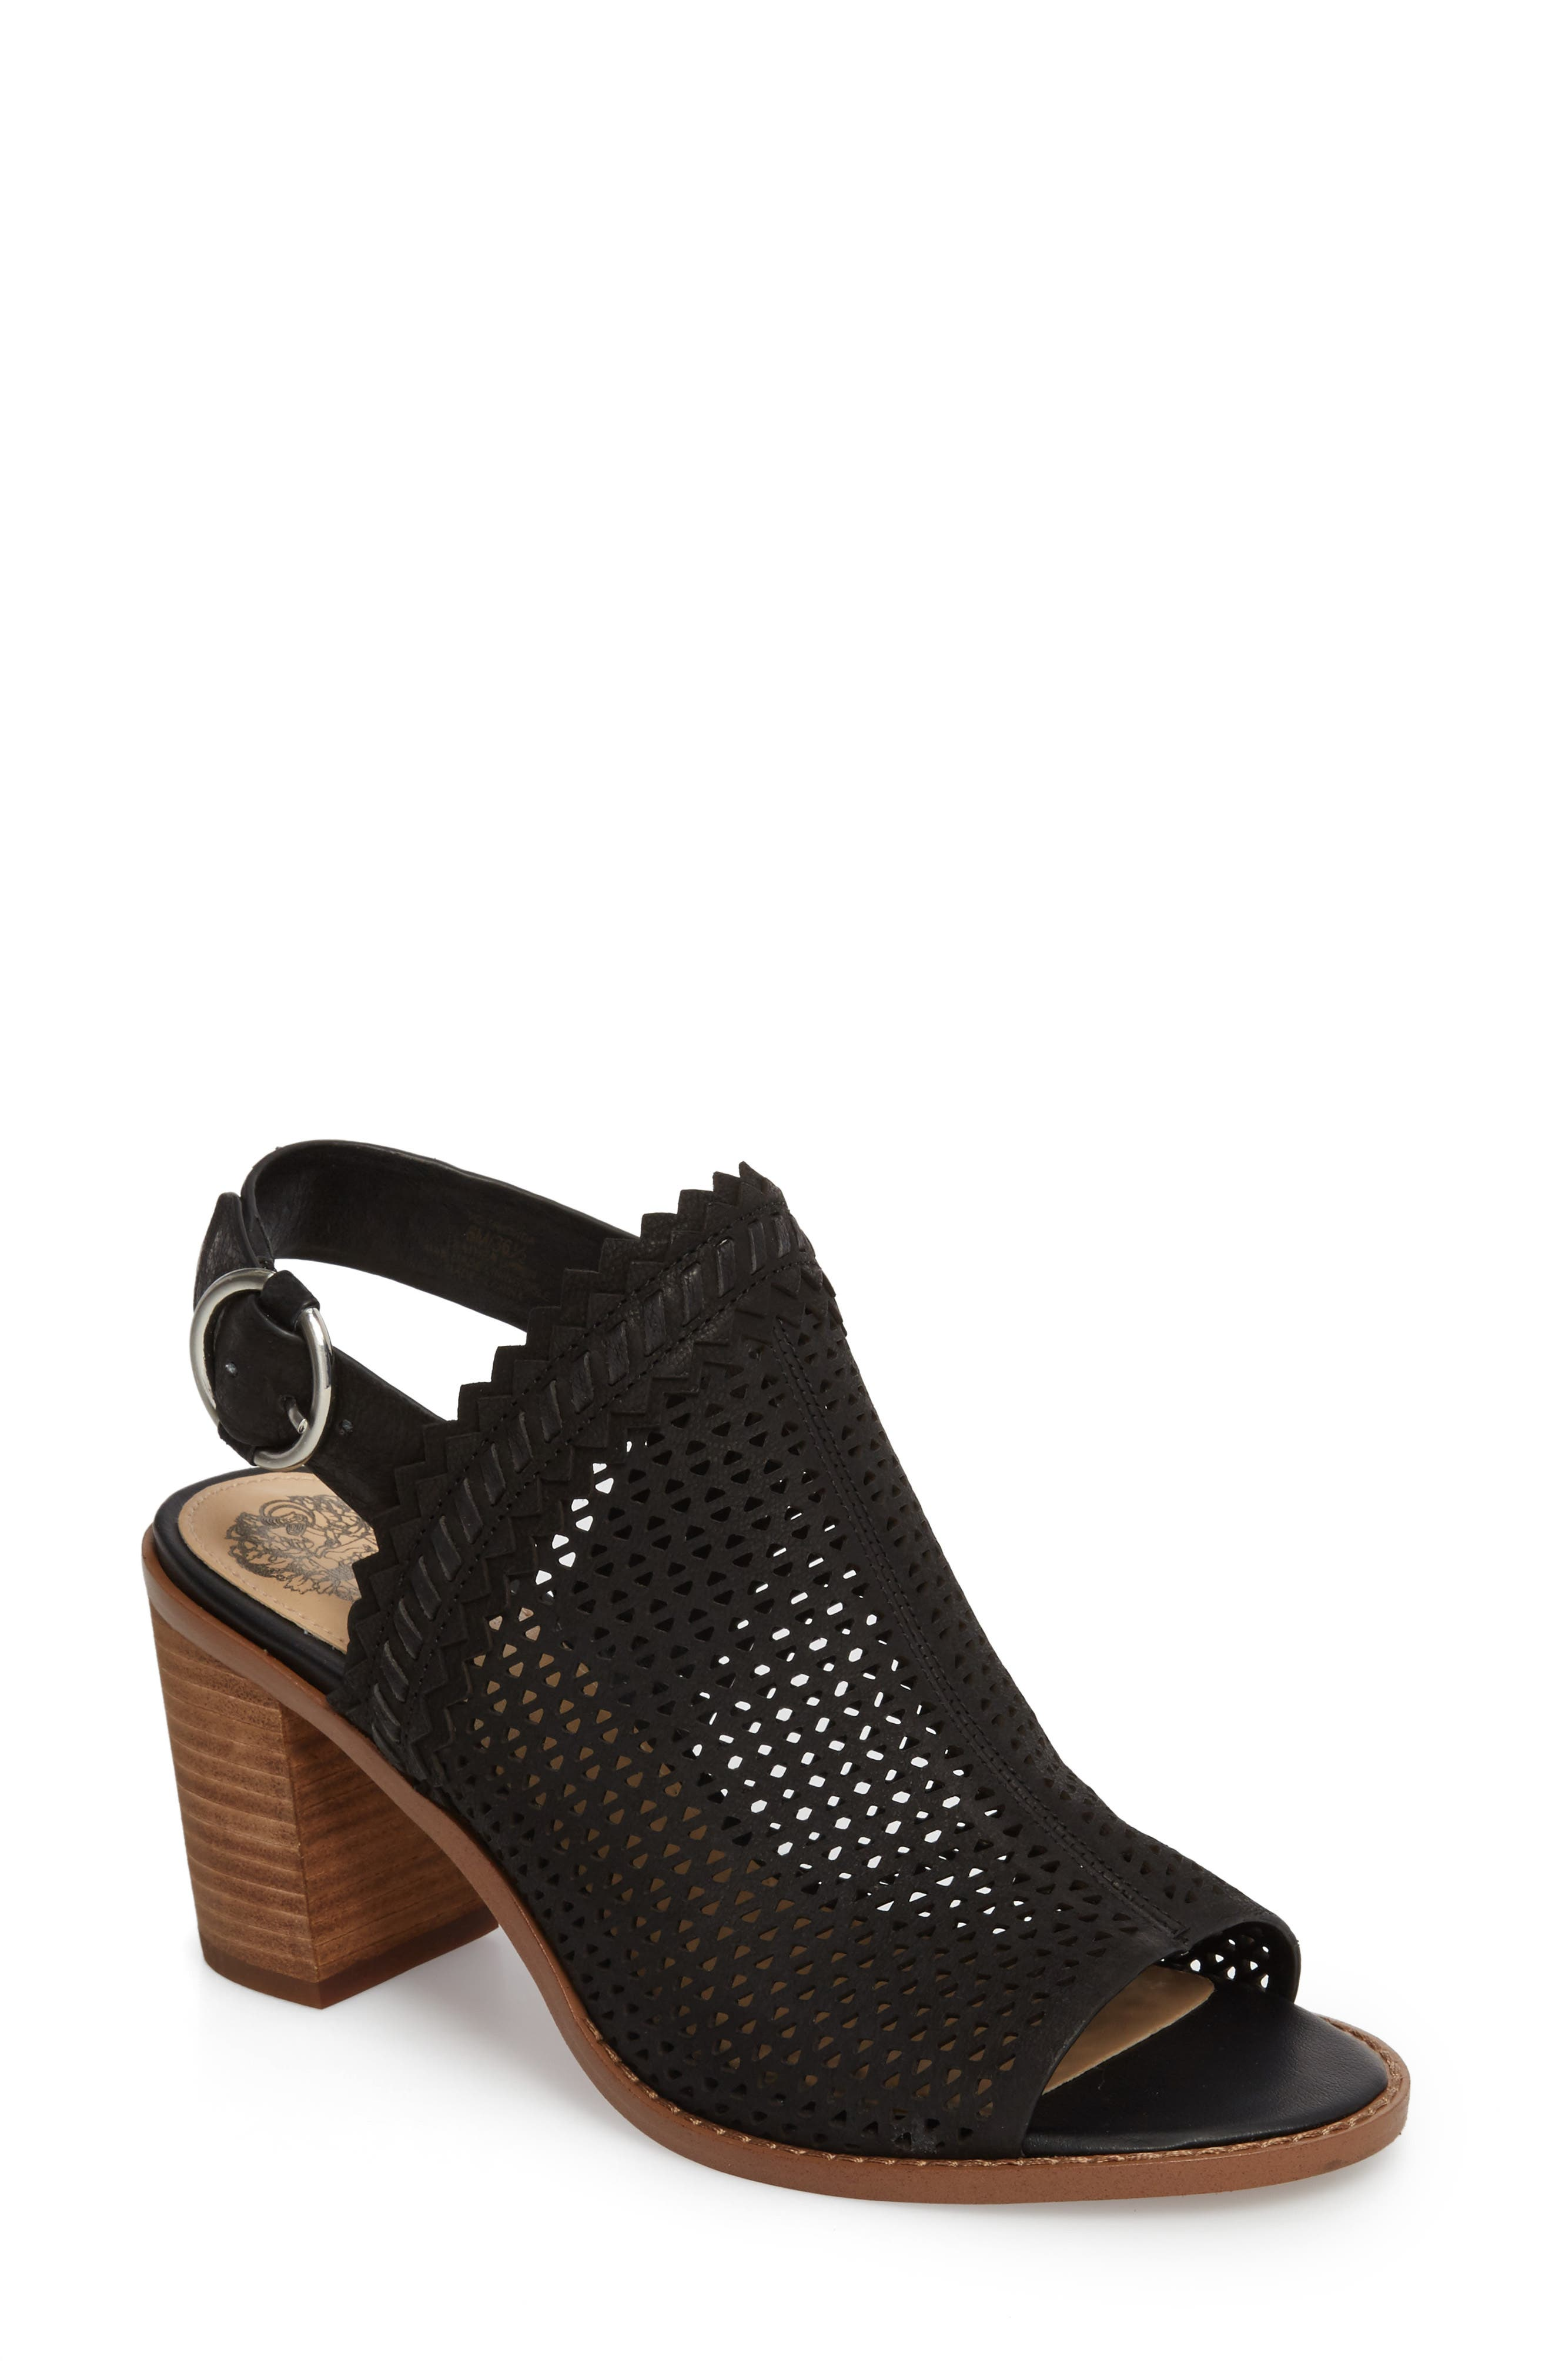 Tricinda Block Heel Sandal,                         Main,                         color, BLACK LEATHER